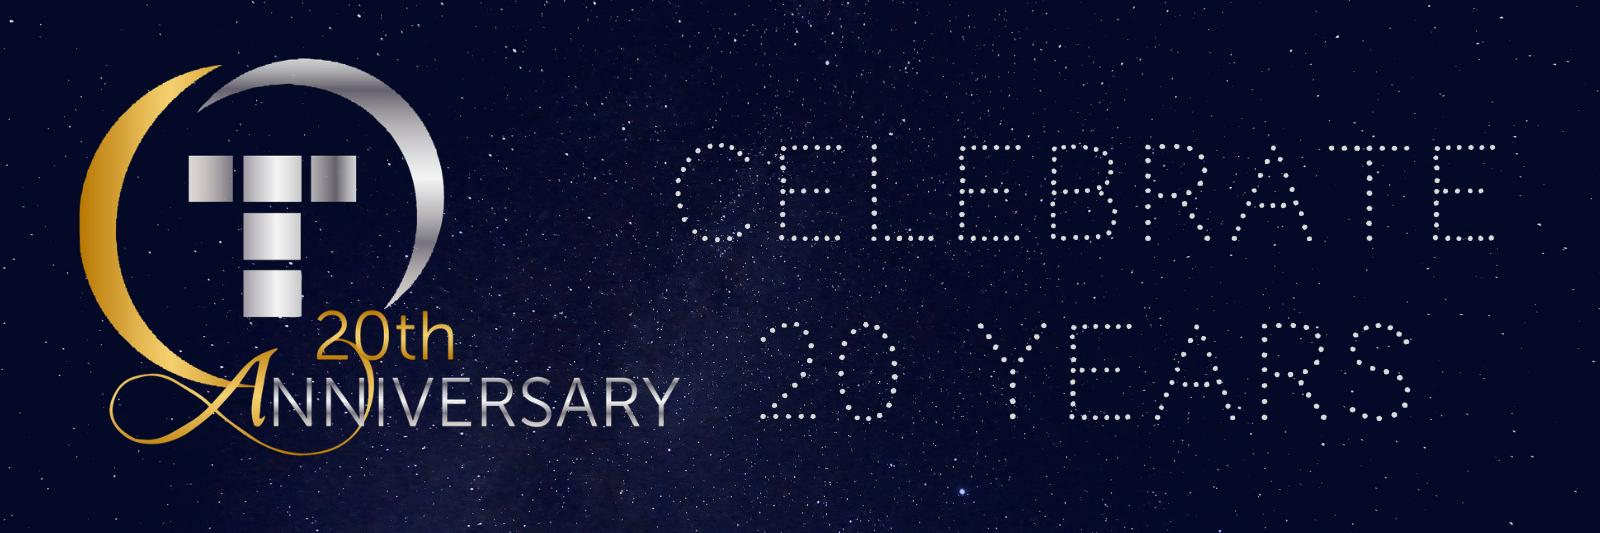 Celebrate..png